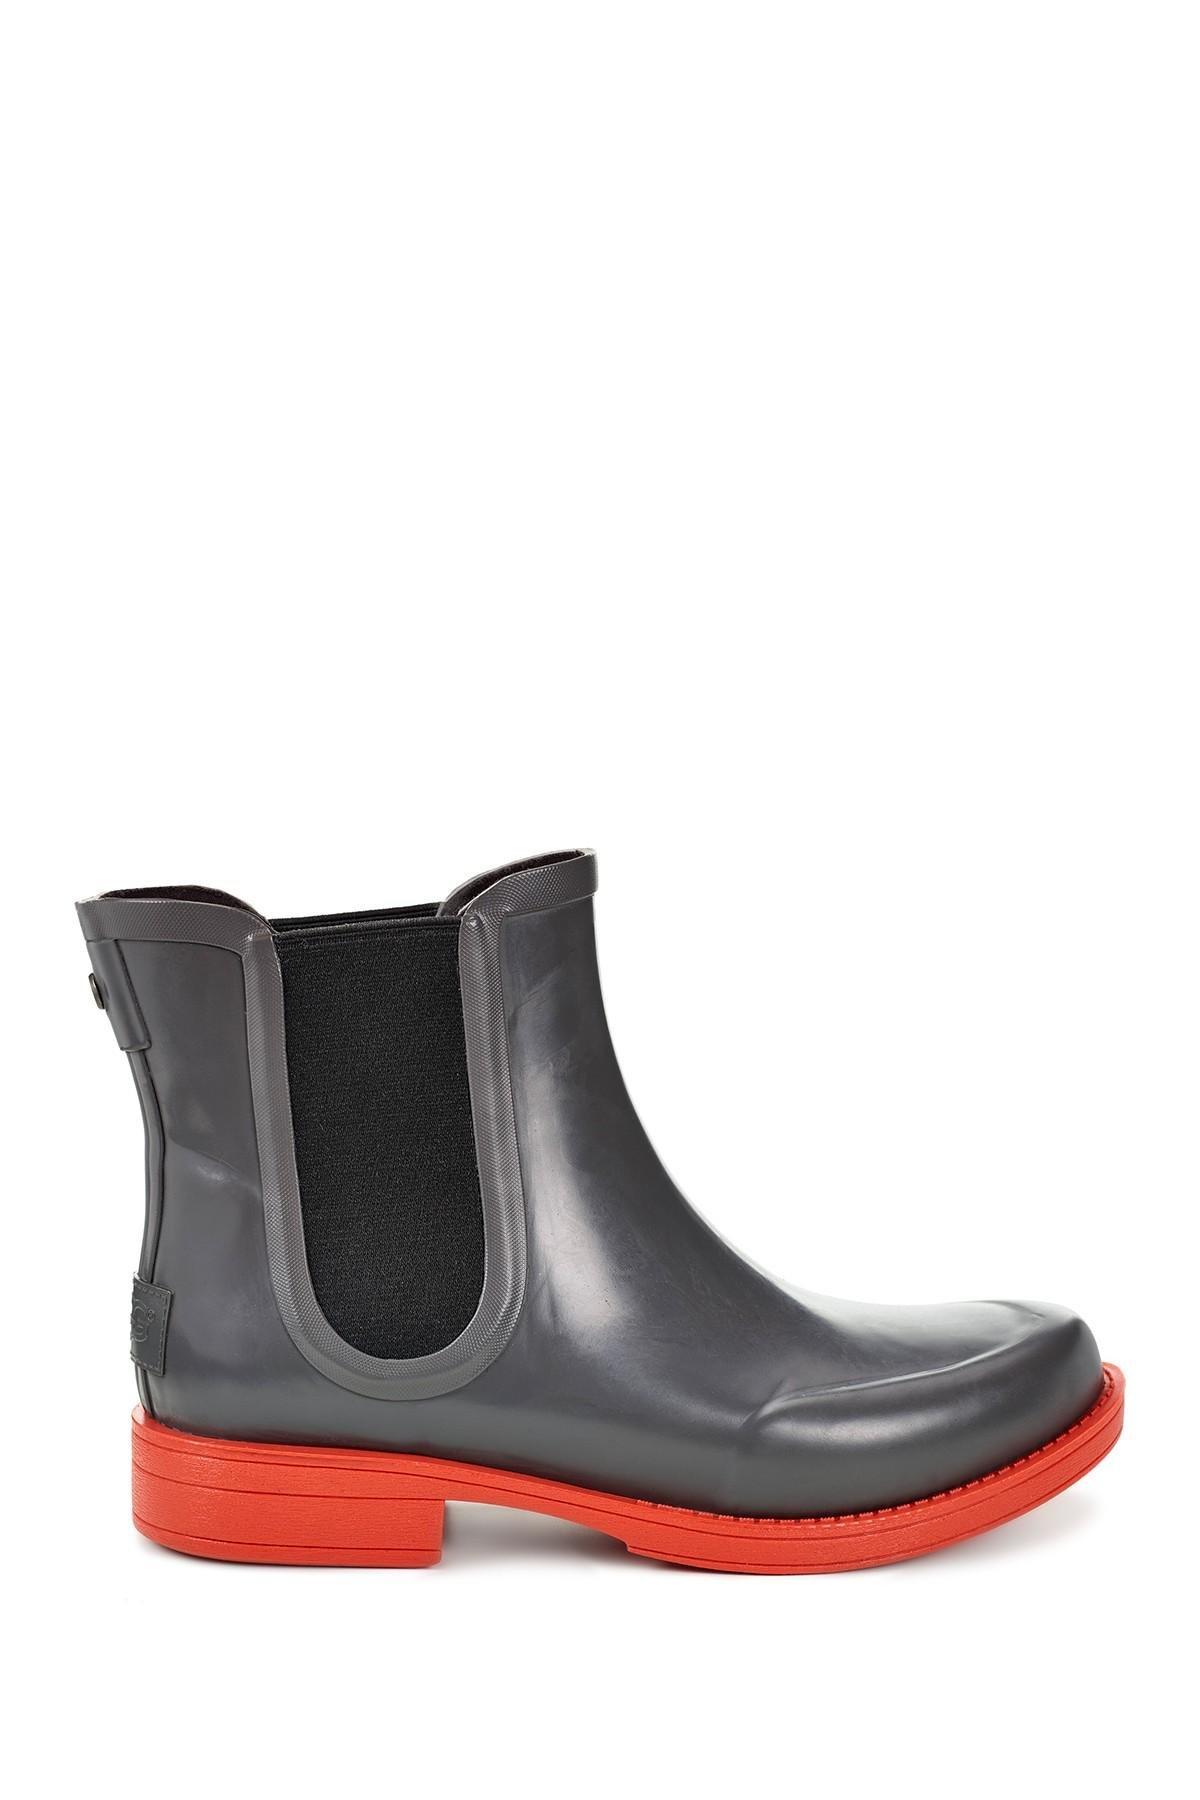 65a1e8bb7ea Lyst - UGG (r) Aviana Chelsea Rain Boot (women)